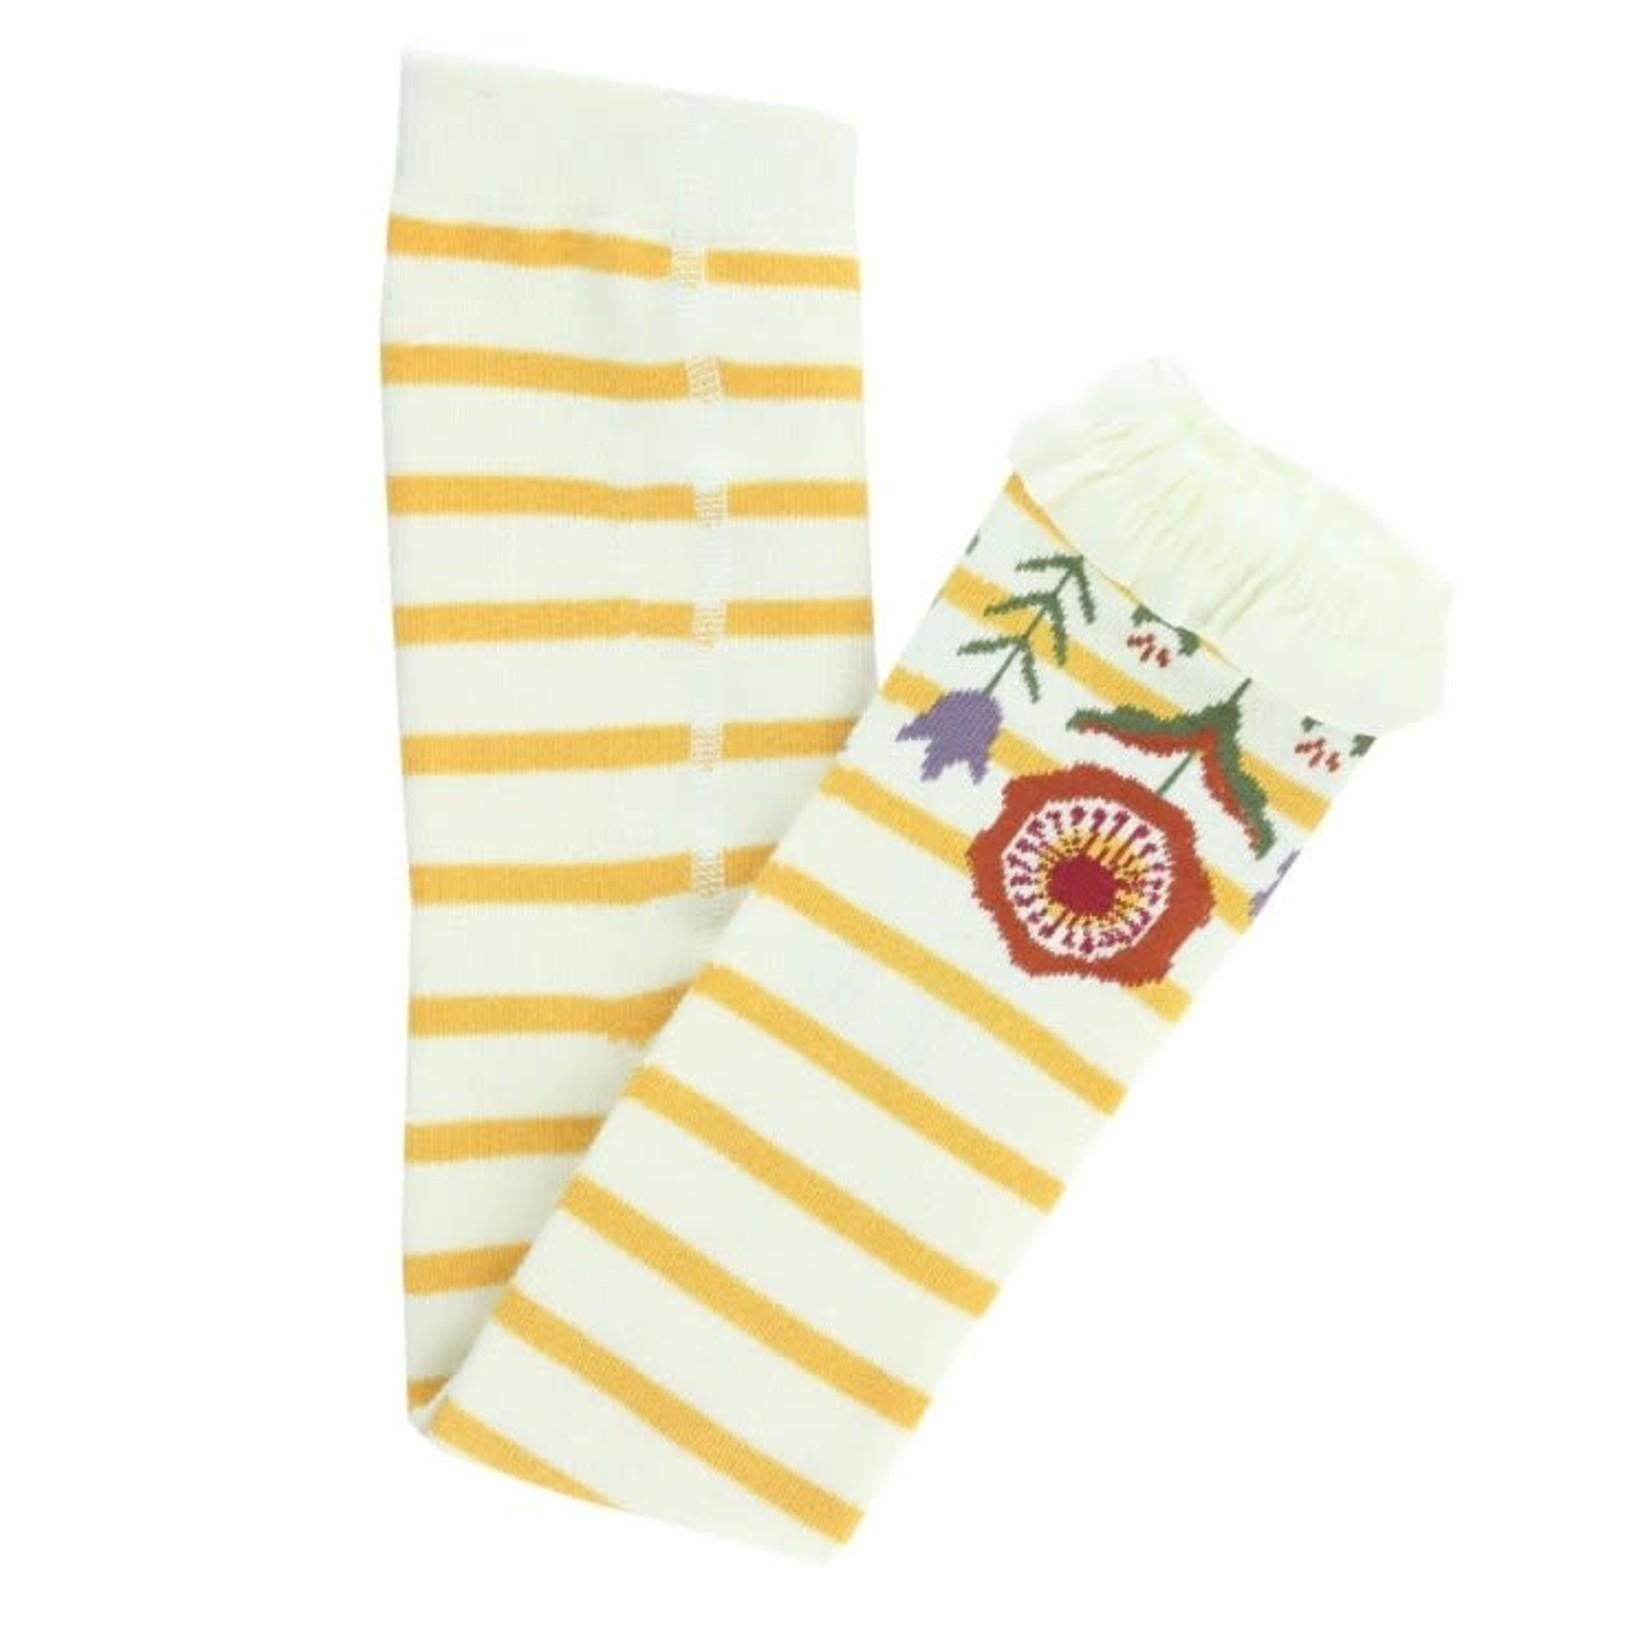 RuffleButts Footless Ruffle Tights, Golden Yellow & Ivory Stripe 6-12M